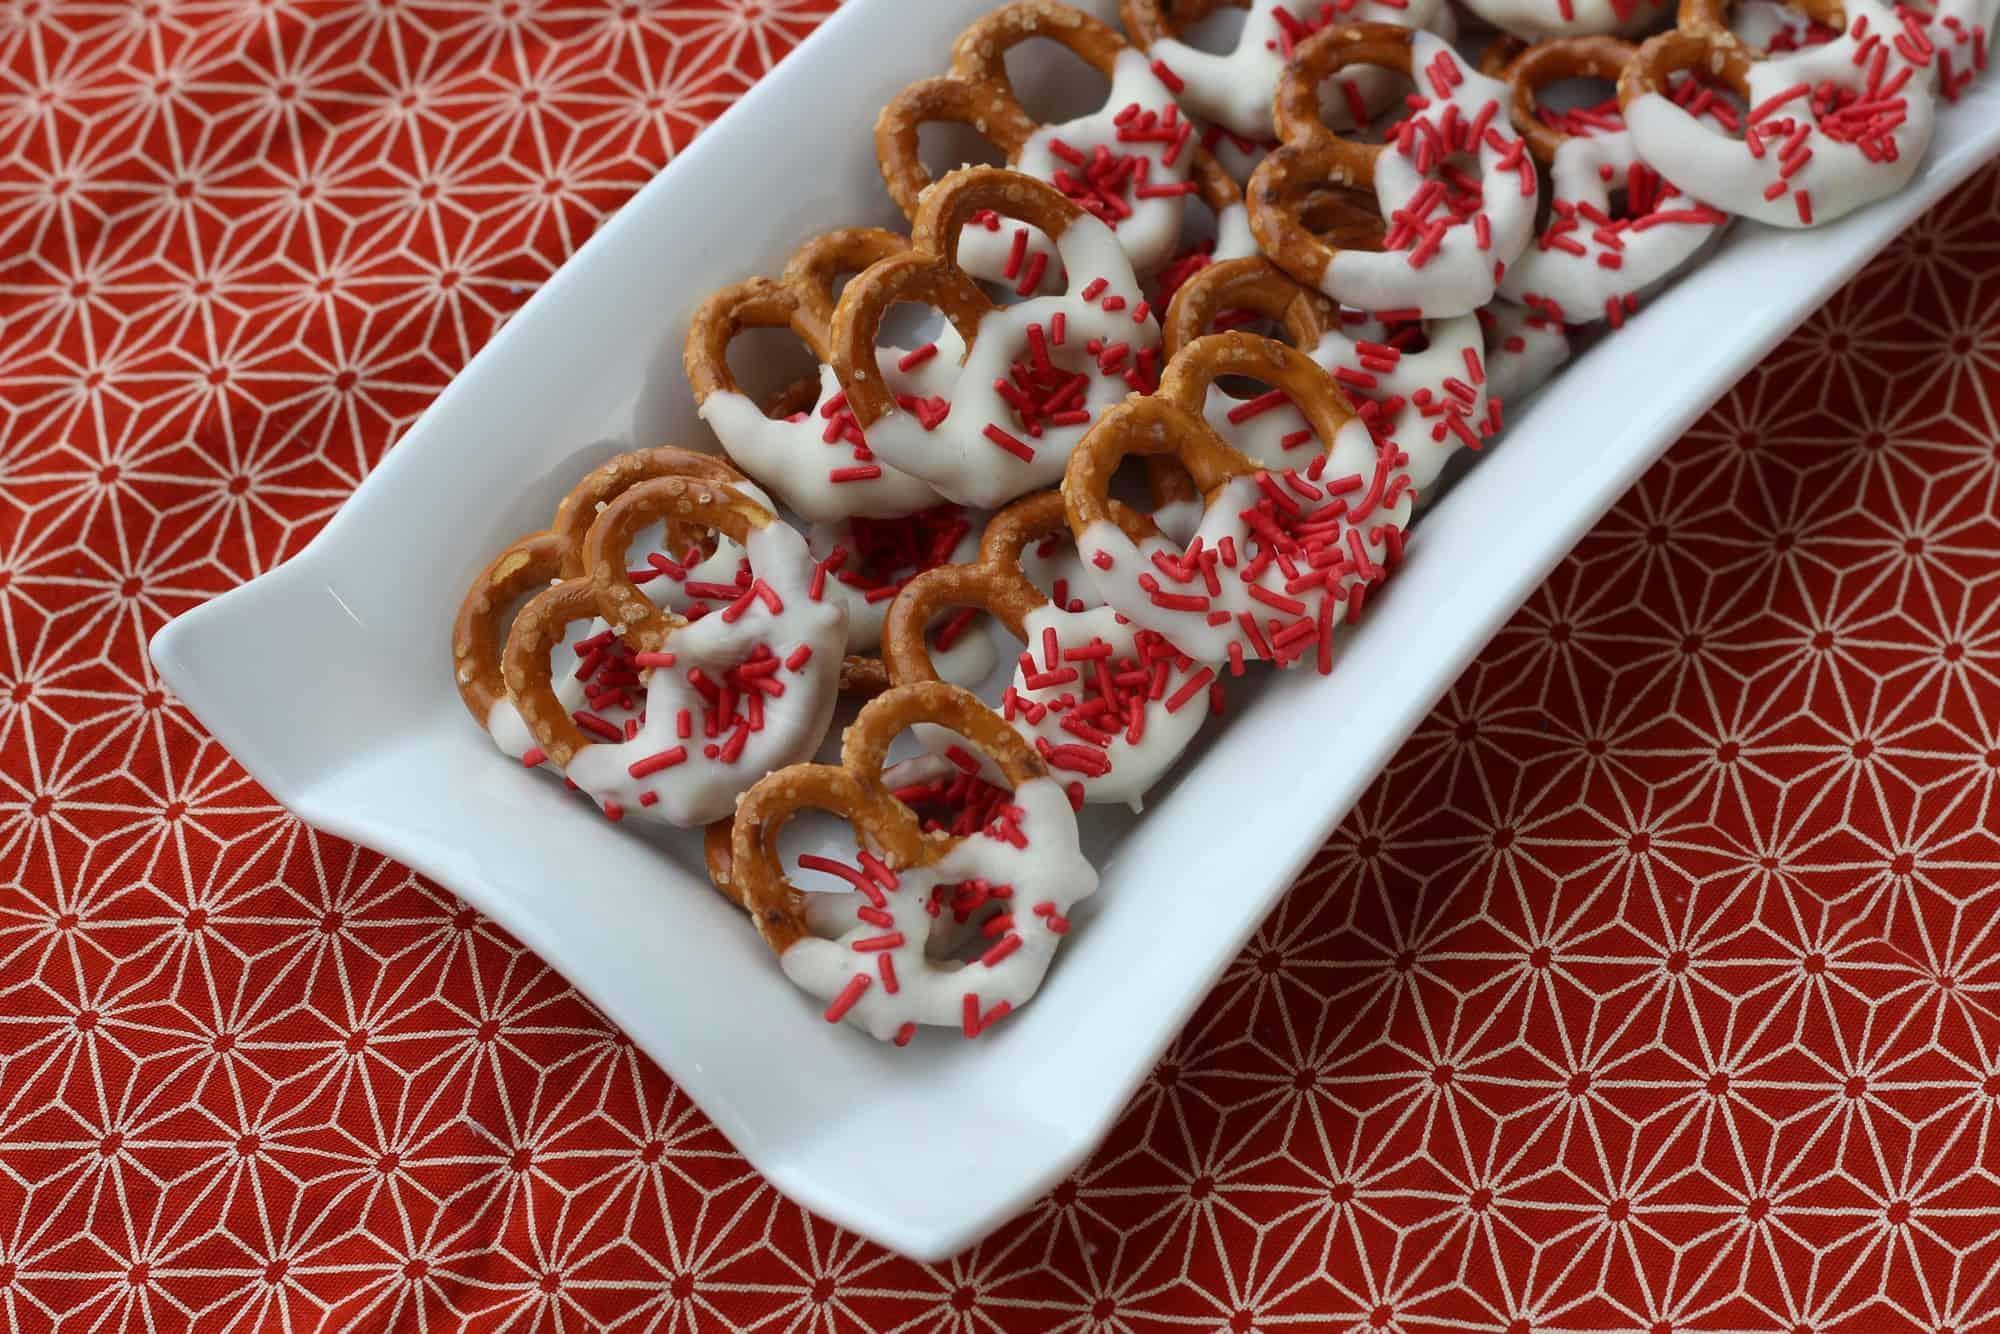 Easy Canada Day Dessert Idea - Chocolate Covered Pretzels